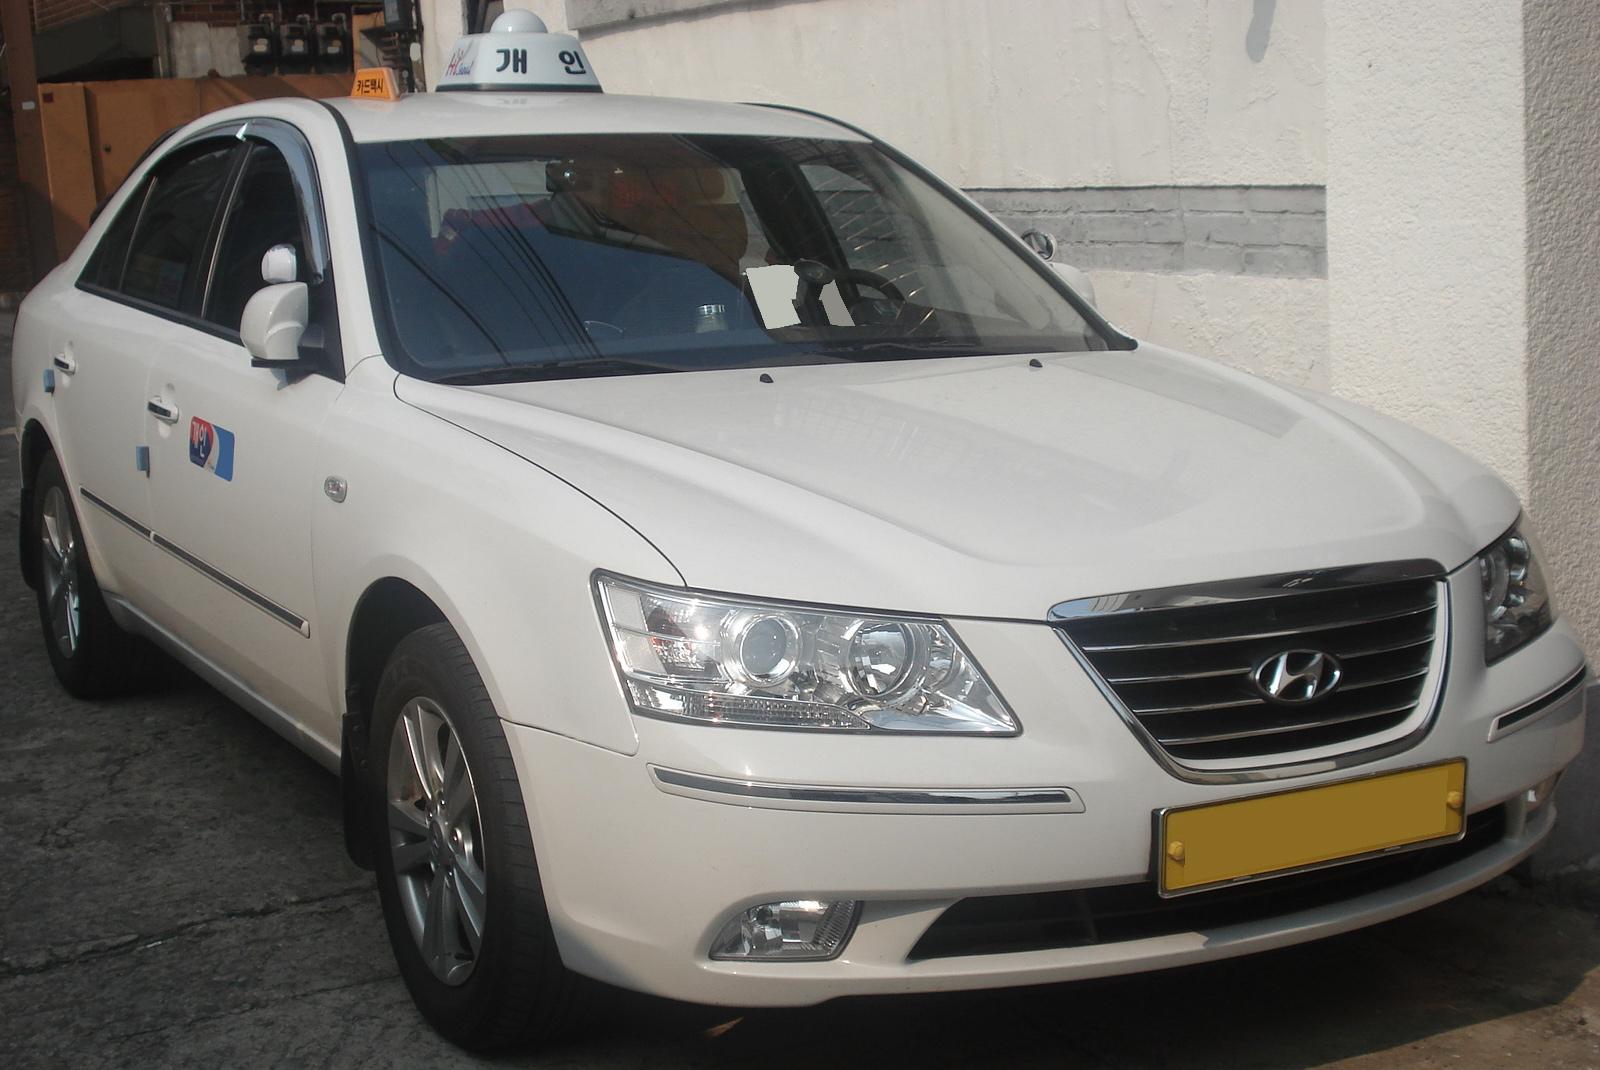 Used Hyundai Cars For Sale In Ghana